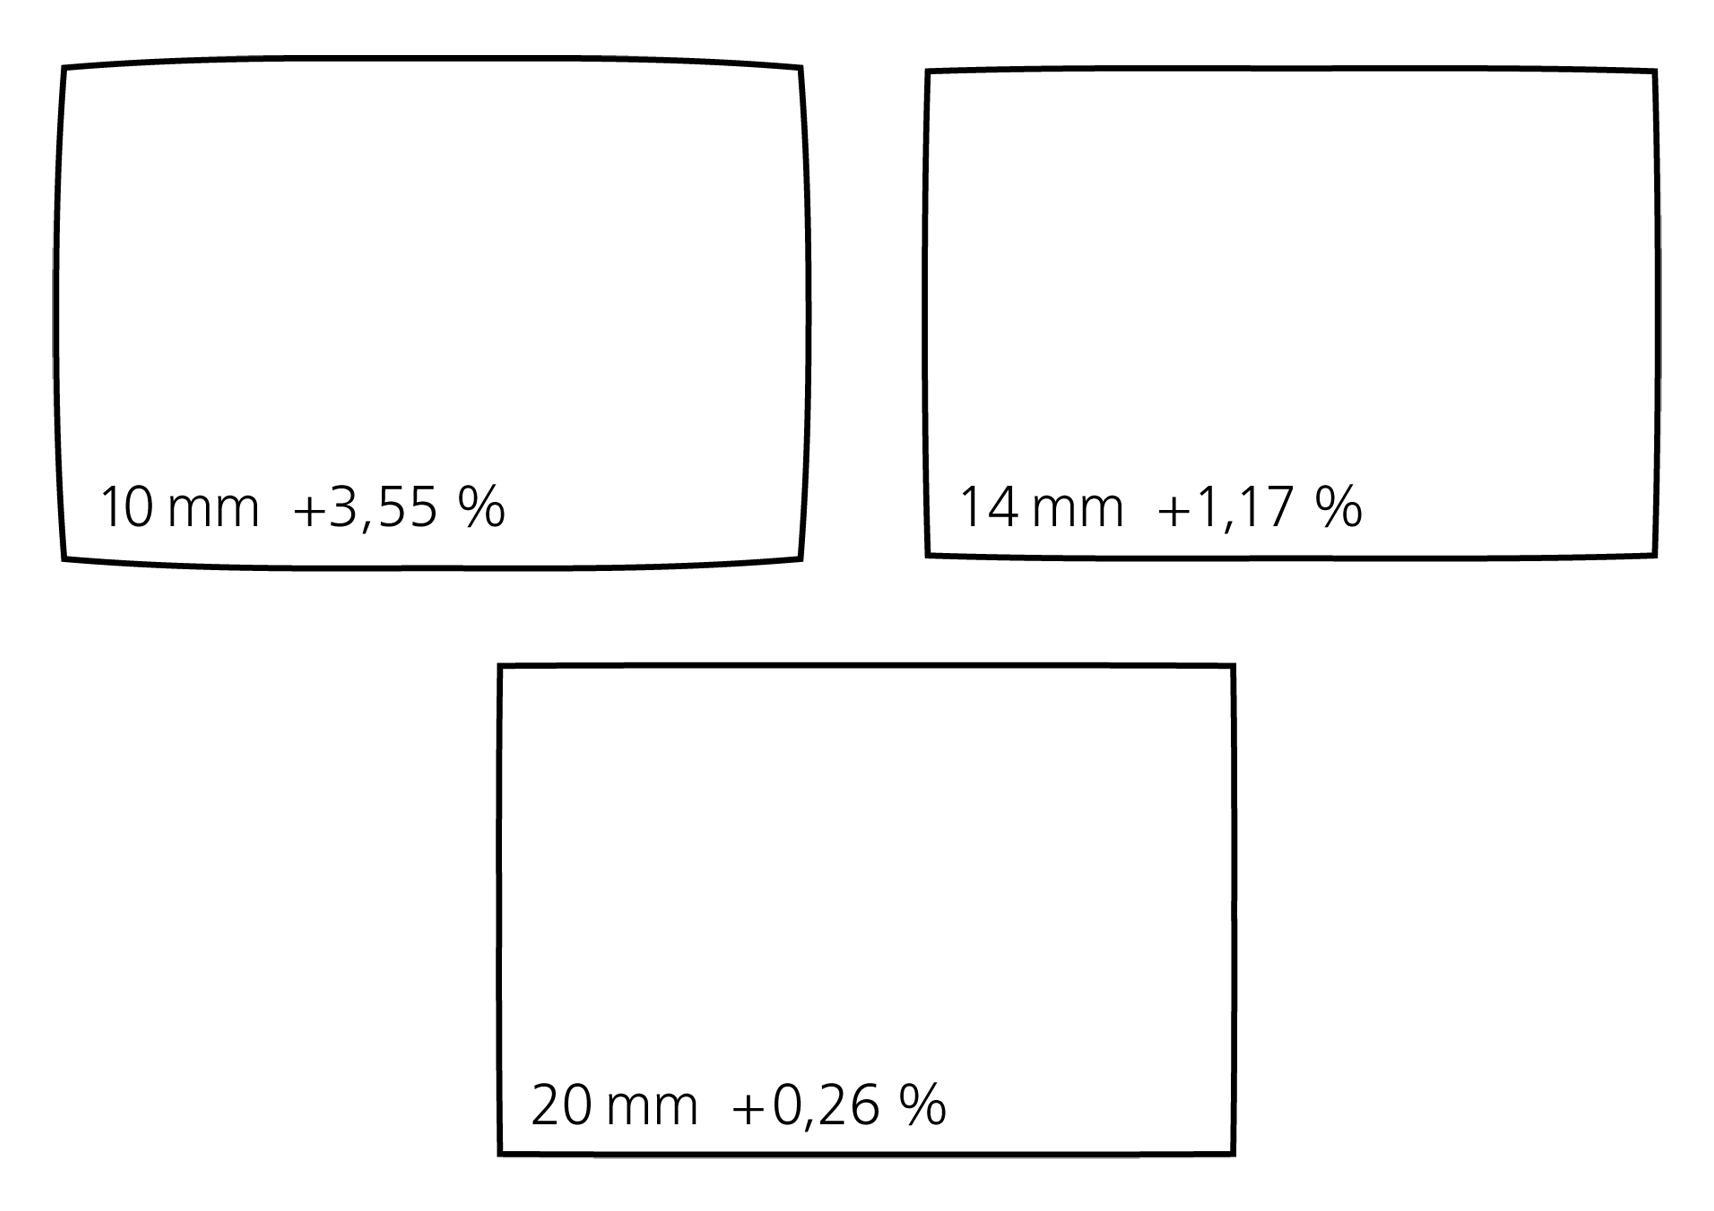 Geometrické zkreslení objektivu AF-P DX Nikkor 10–20 mm F4,5–5,6G VR